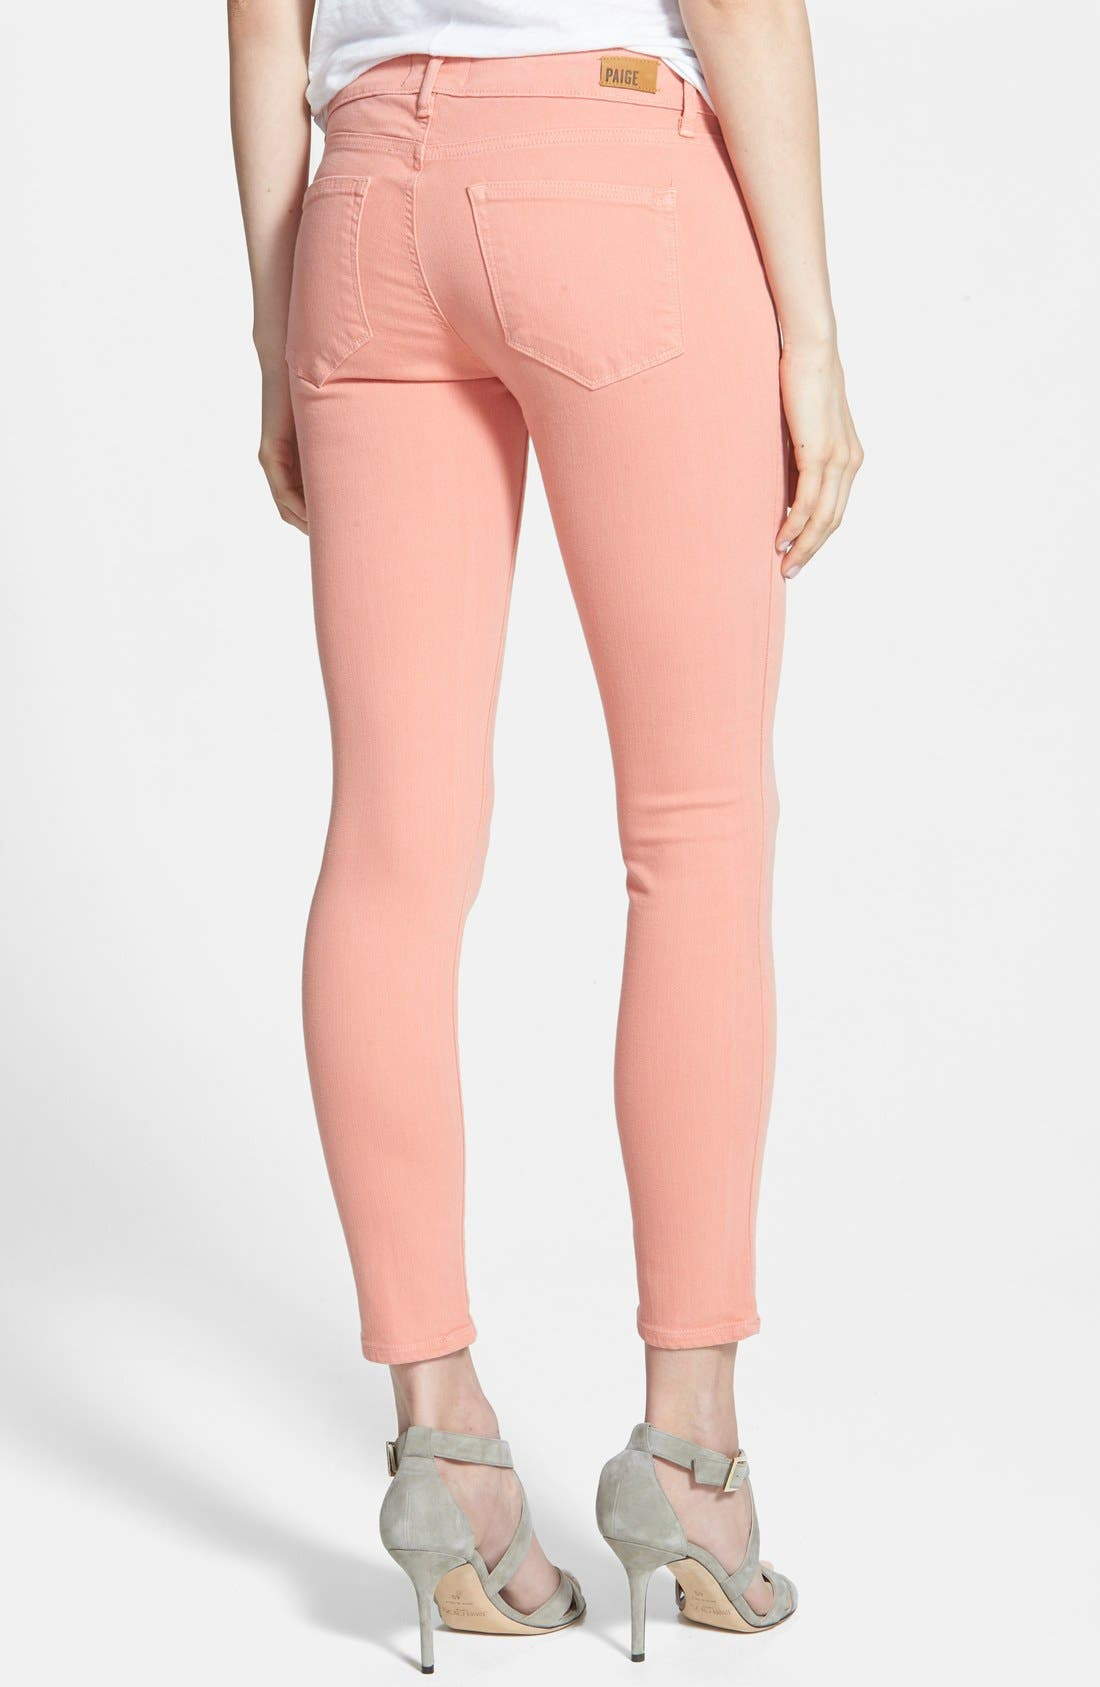 PAIGE, Denim 'Verdugo' Ankle Super Skinny Jeans, Alternate thumbnail 2, color, 650